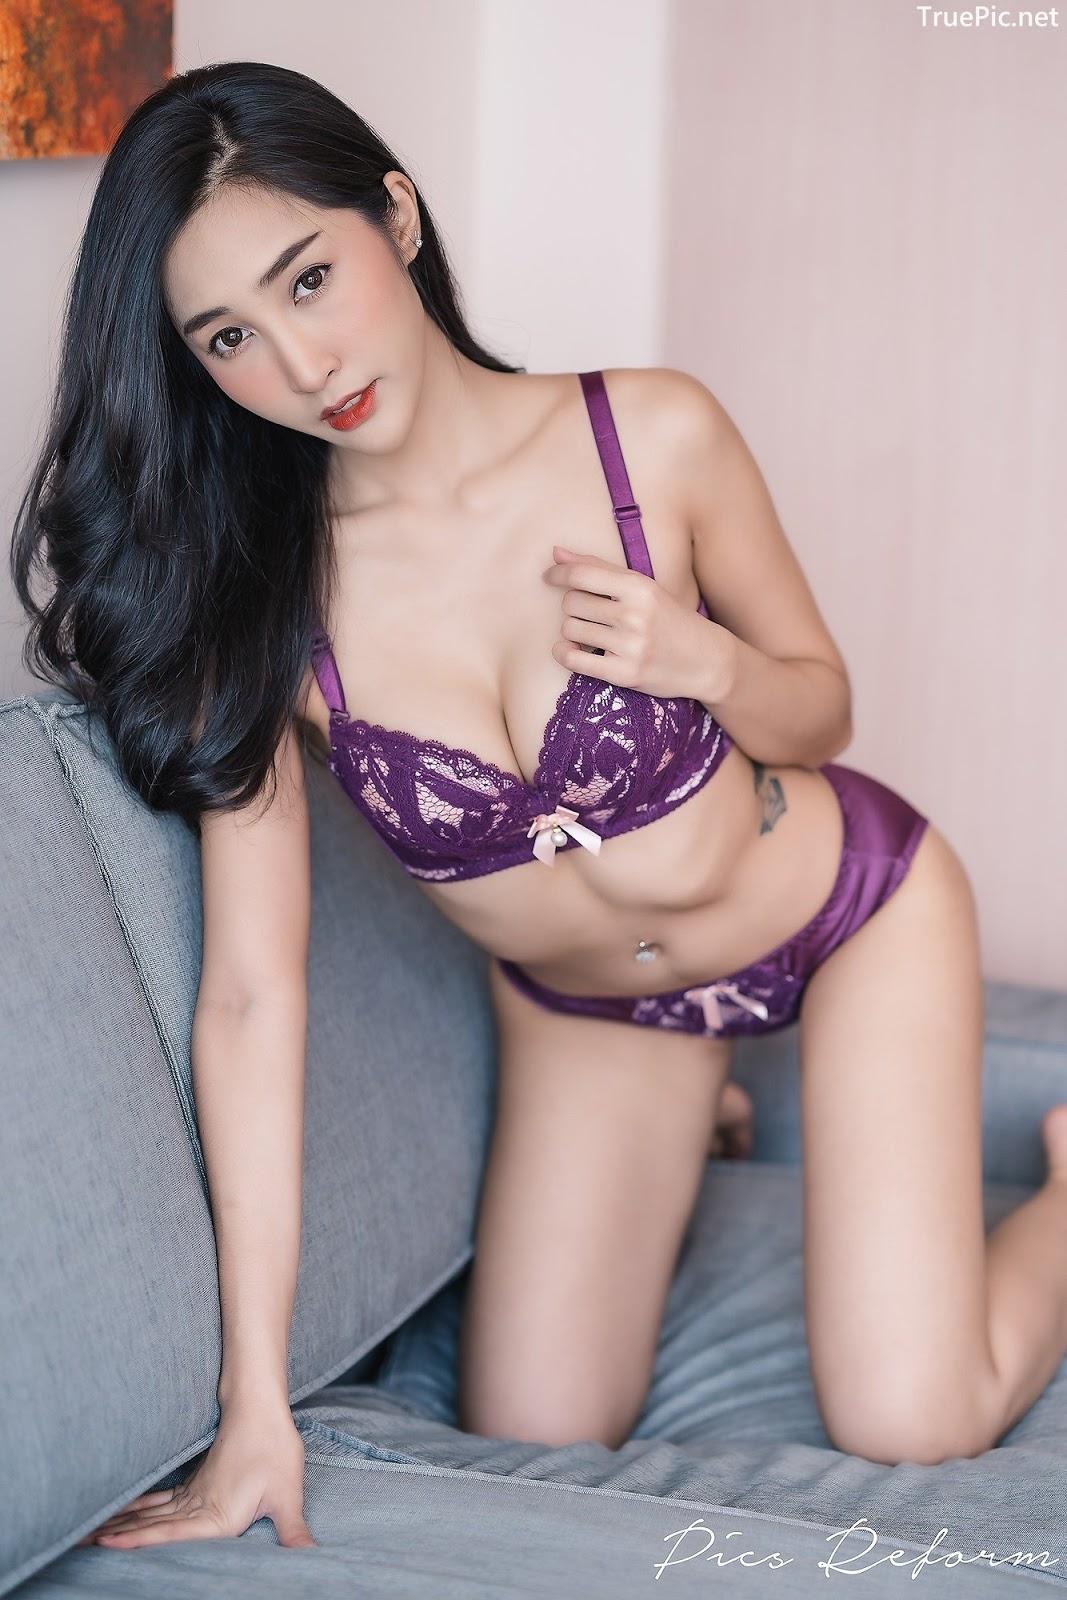 Image-Thailand-Sexy-Model-Yanapat-Ukkararujipat-Violet-Girl-TruePic.net- Picture-4